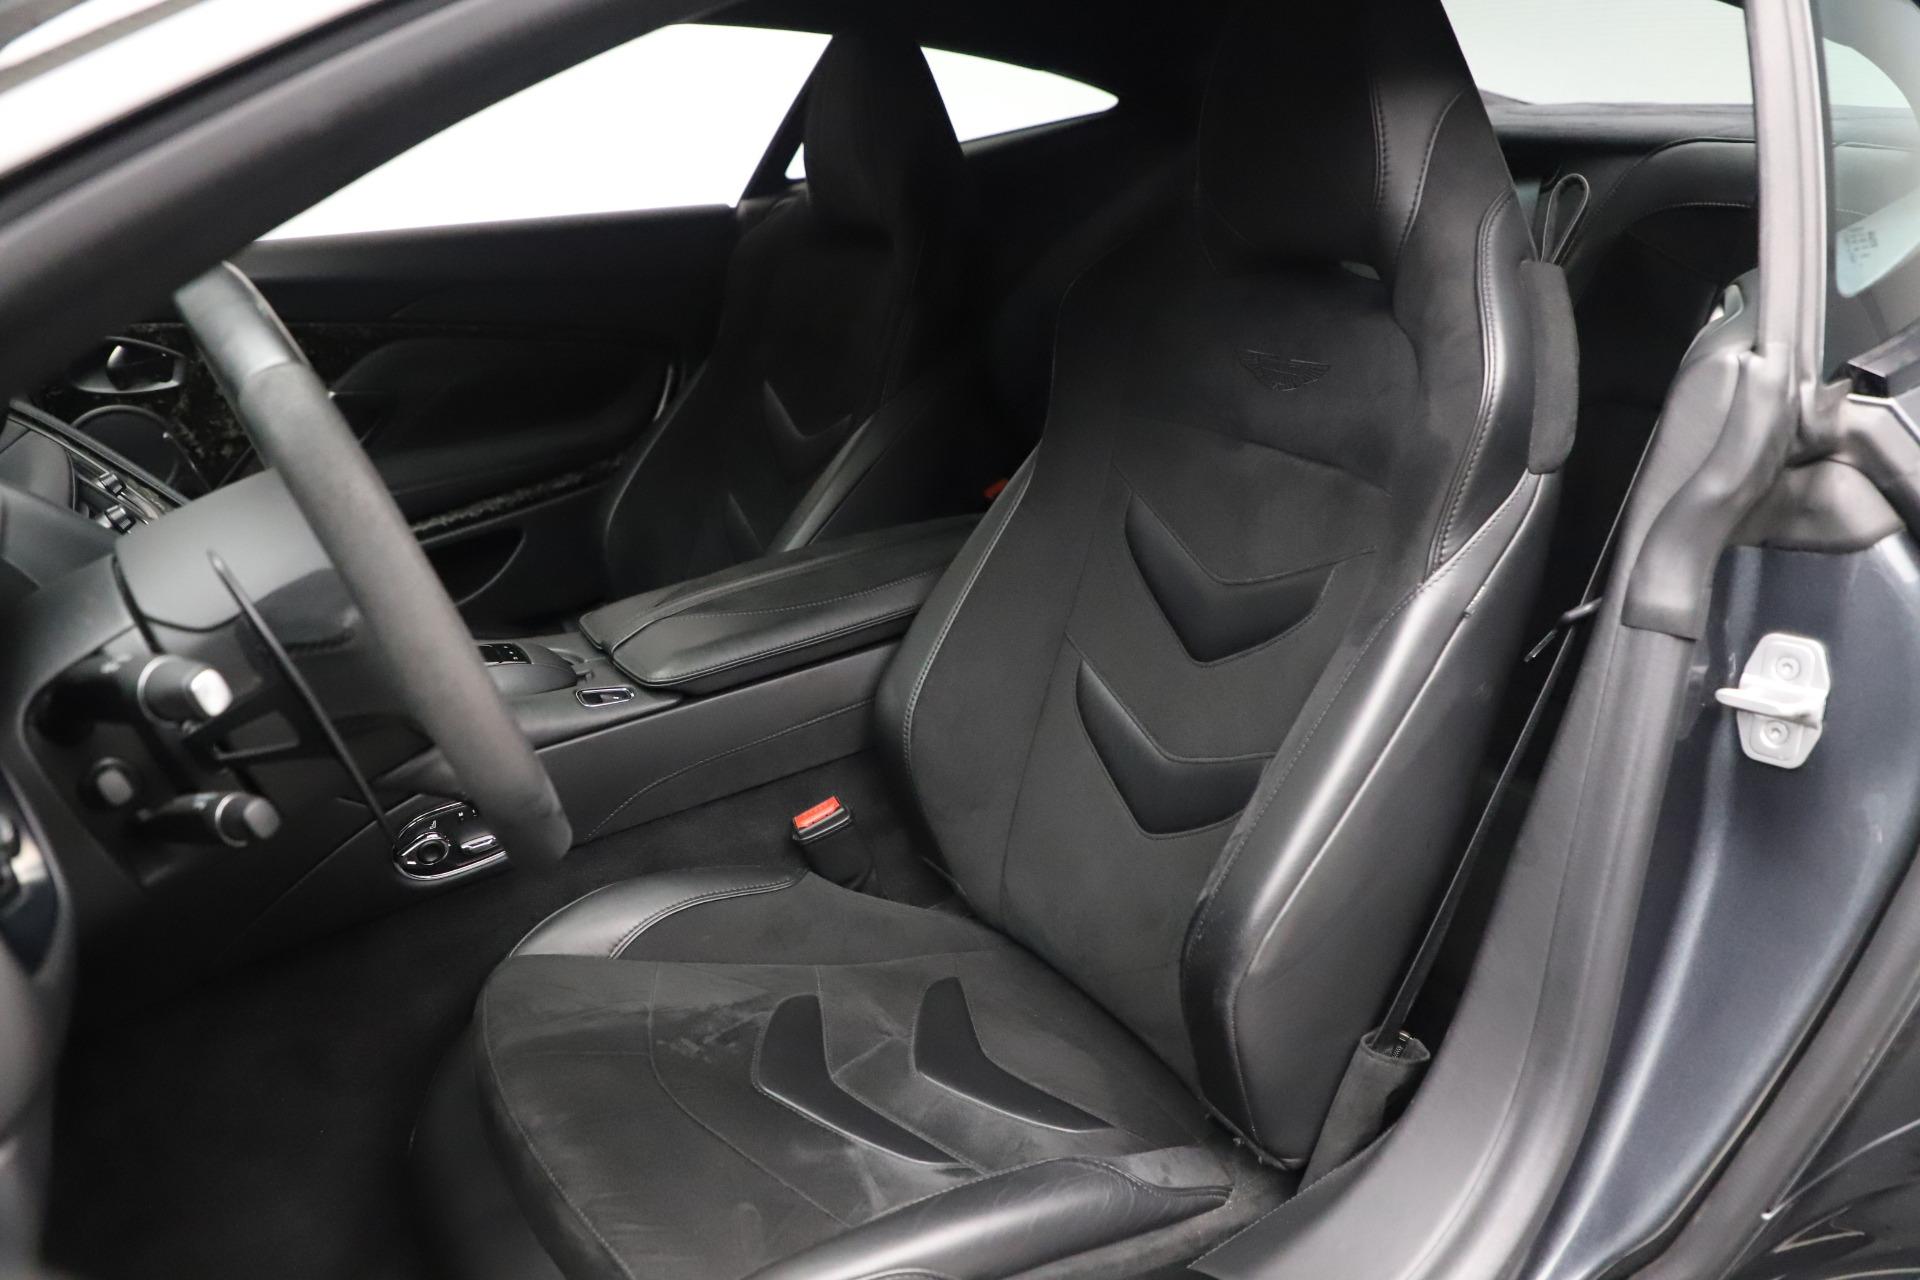 Used 2019 Aston Martin DBS Superleggera Coupe For Sale In Westport, CT 3570_p15